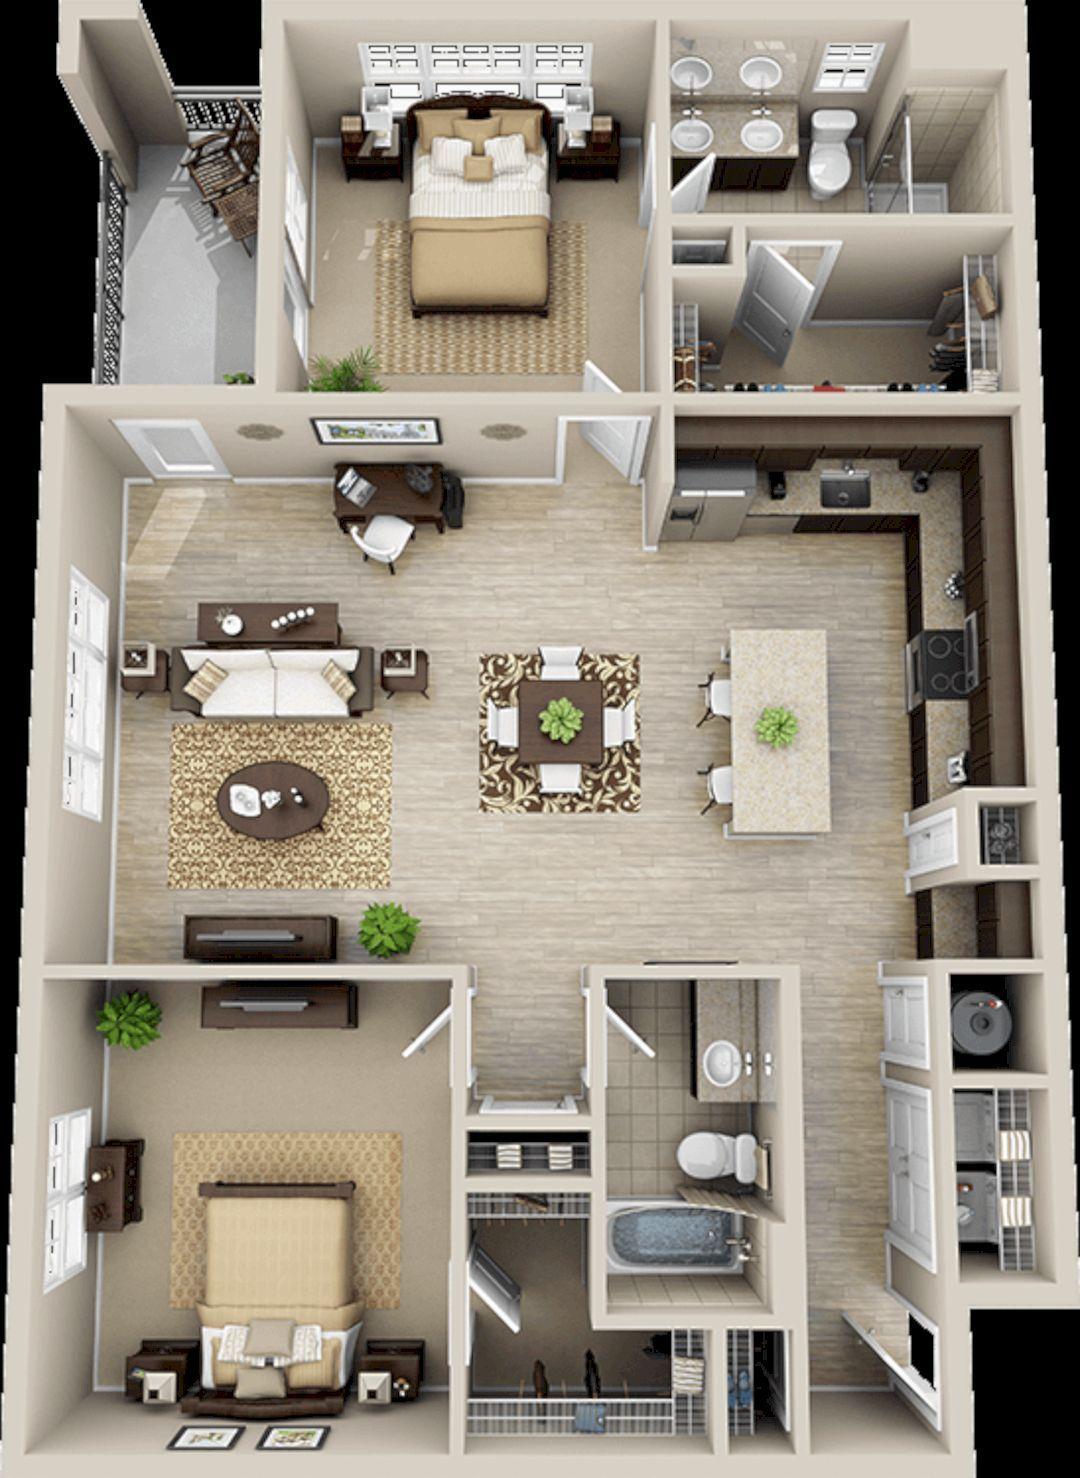 also well designed house plan design ideas home stuff pinterest rh